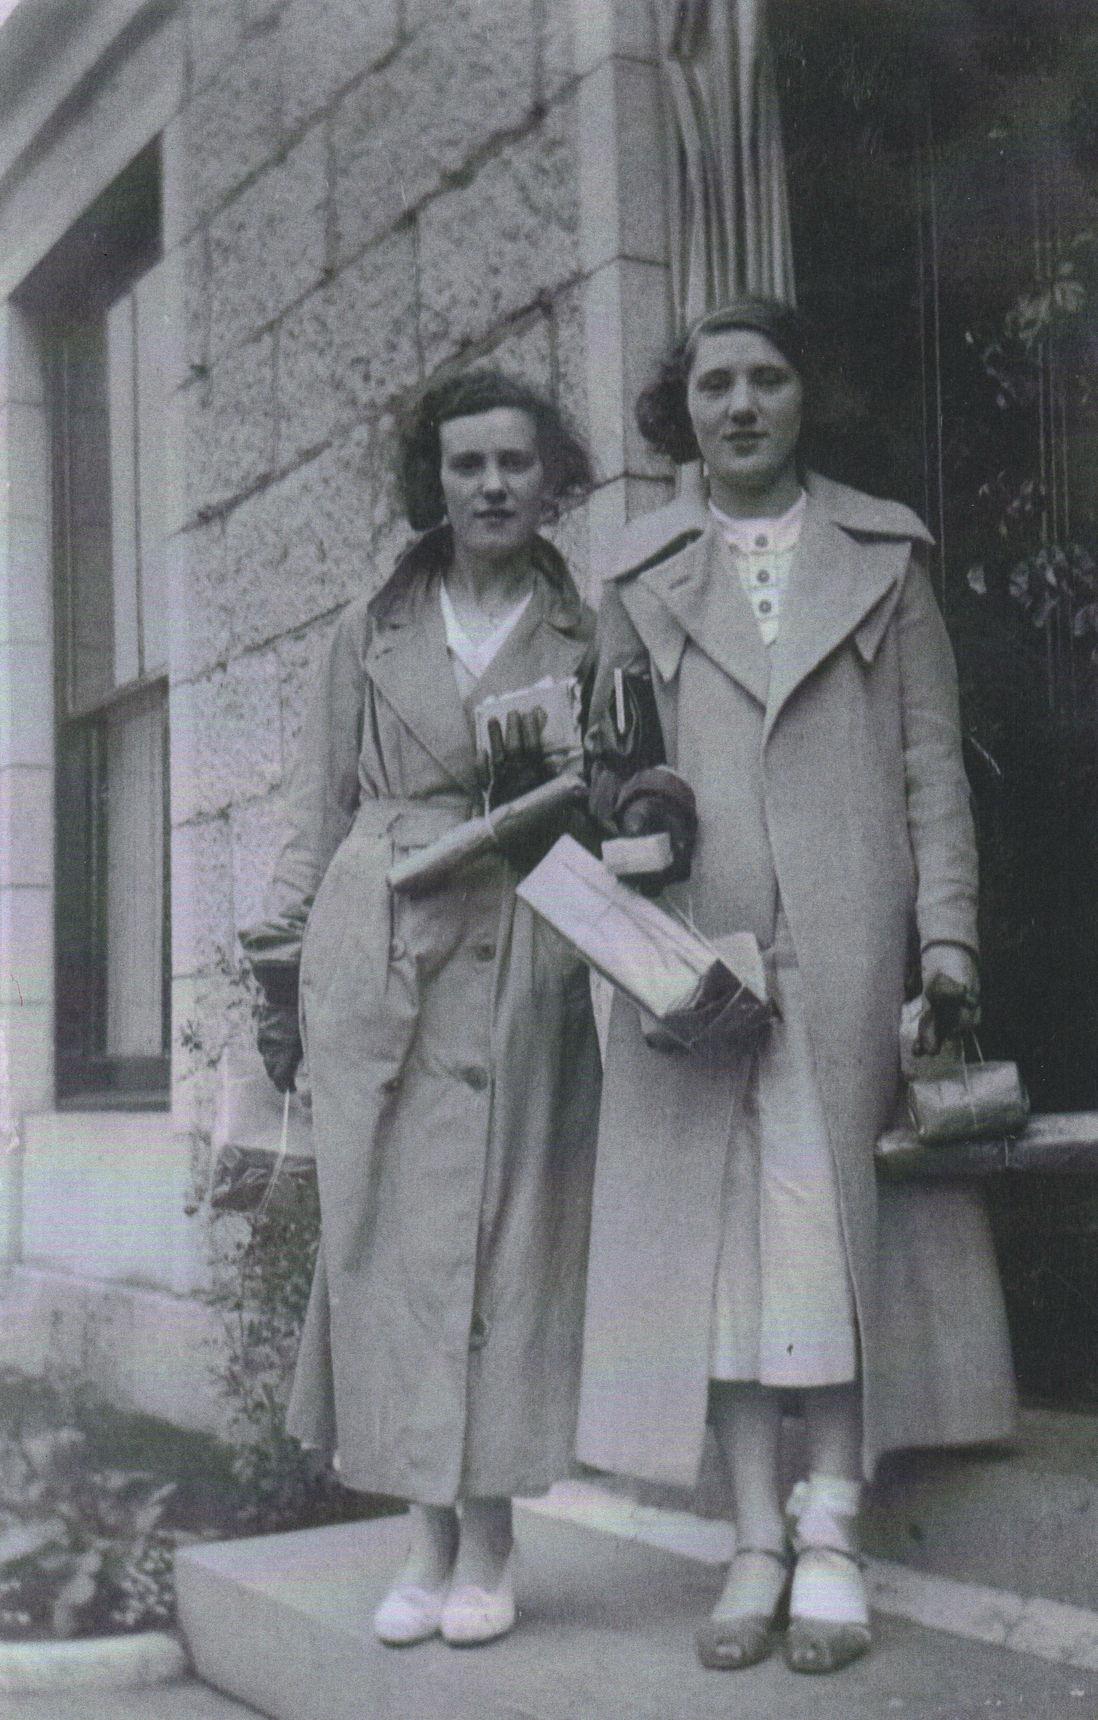 My Mum Bessie W.F. Shaw with her friend Belle Jackson at an Aberdeen Guest House.